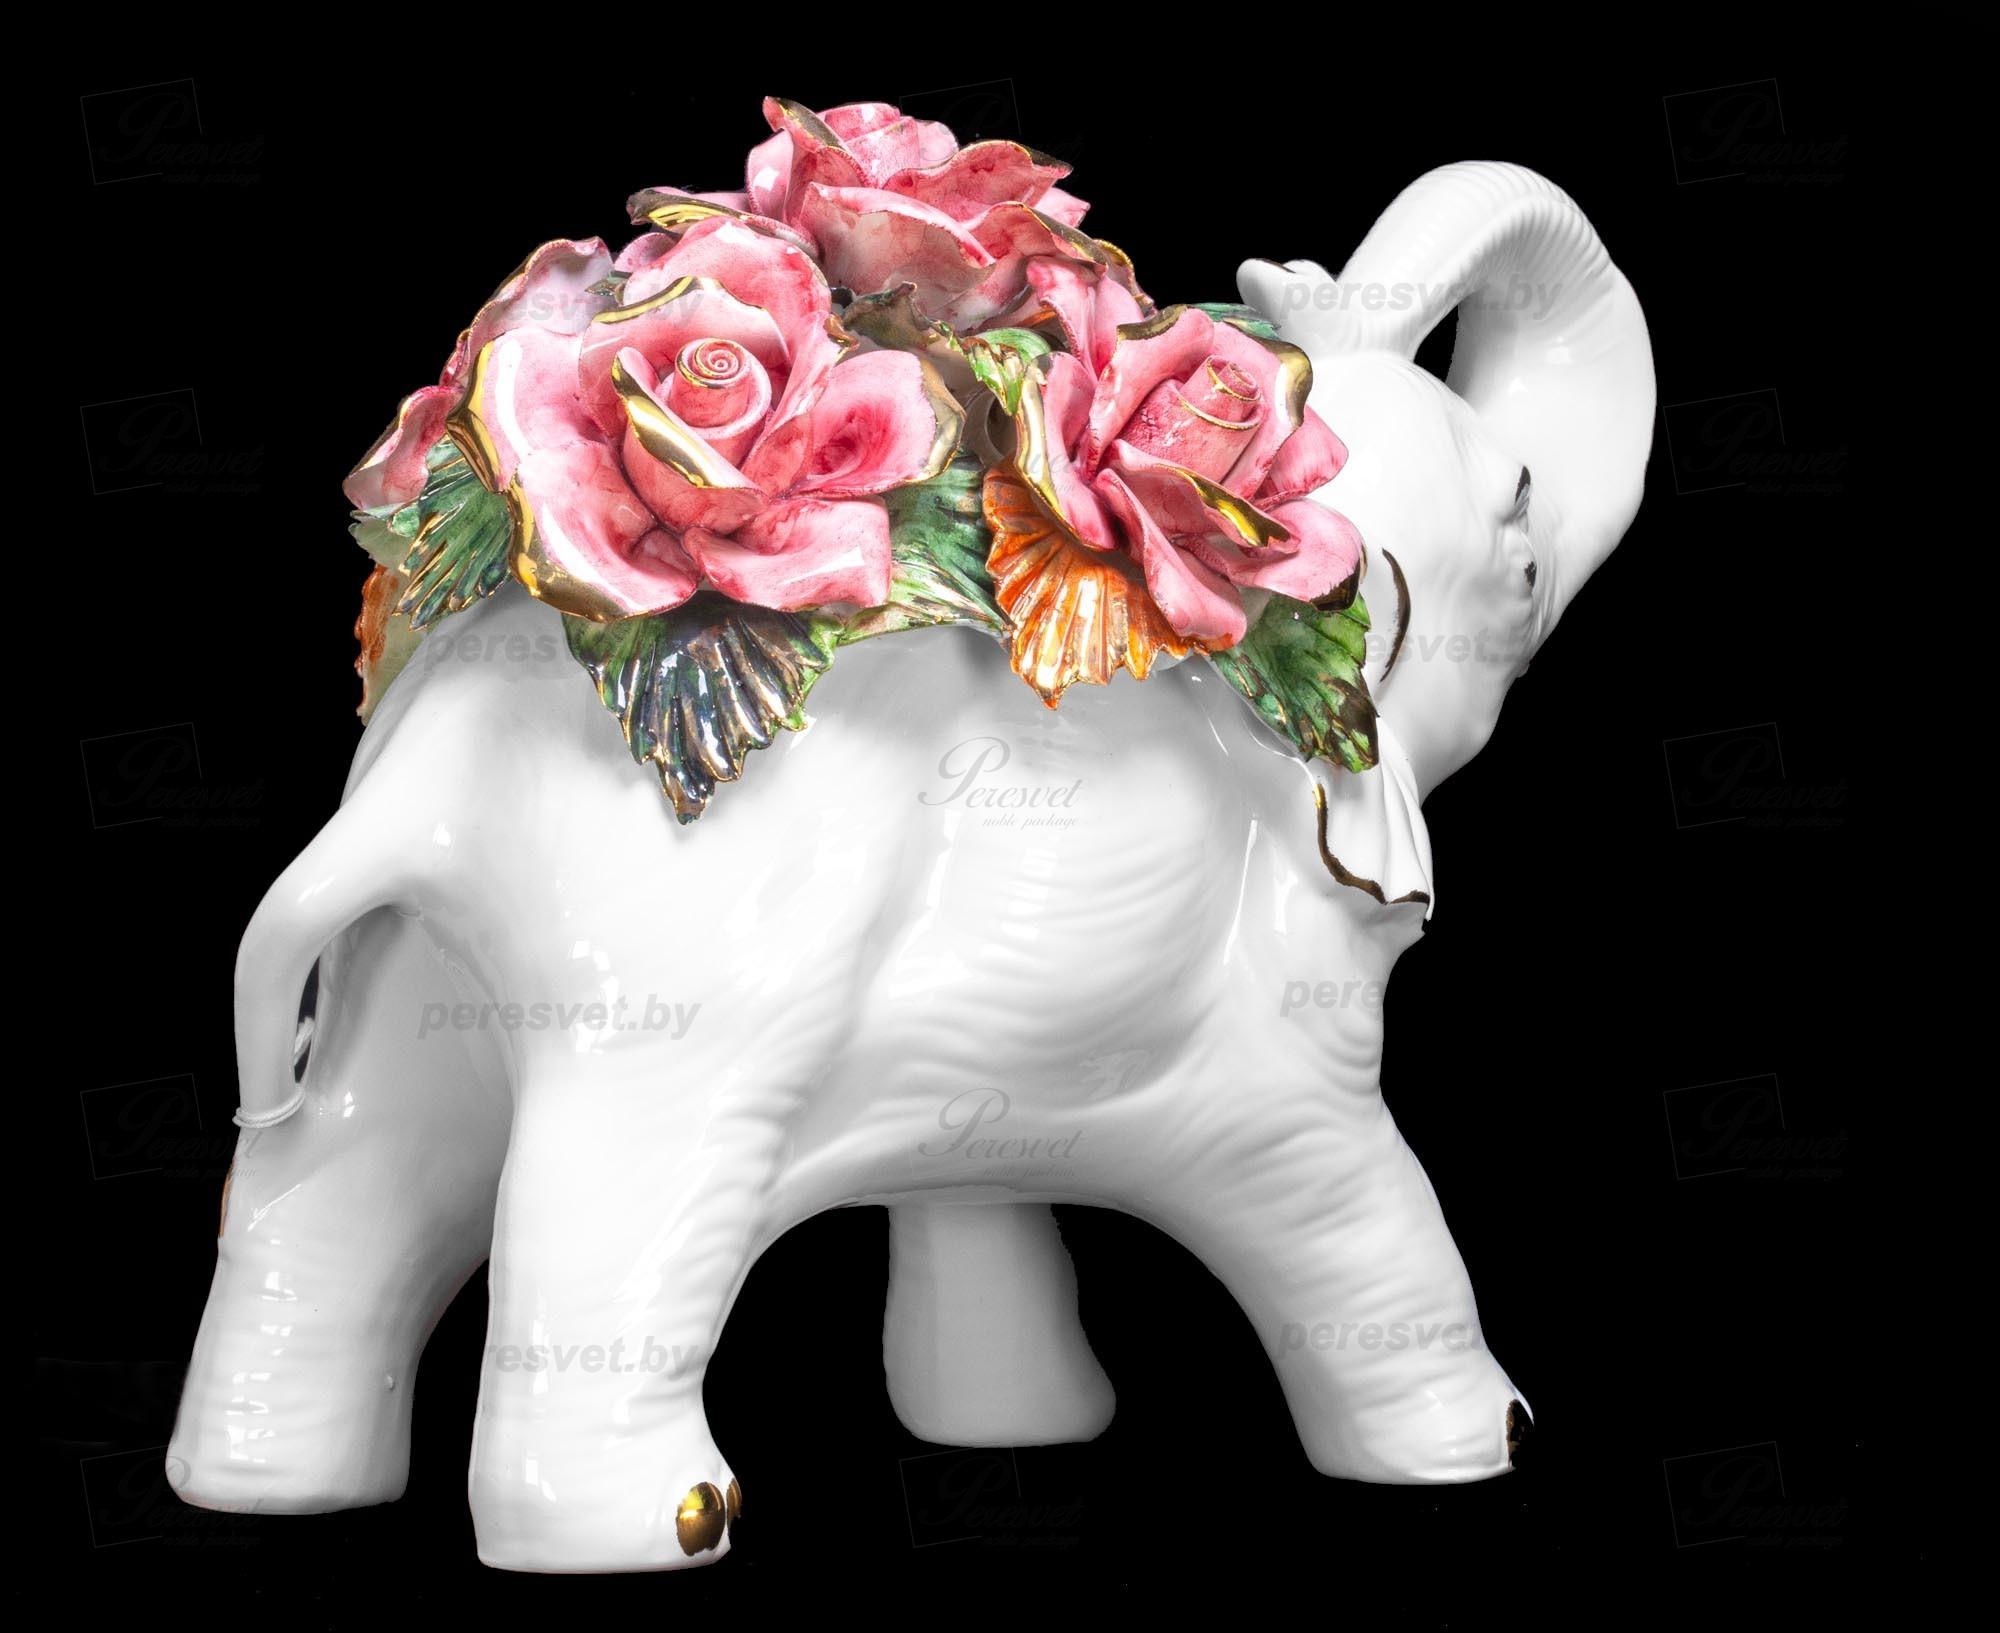 Слон с цветами Elefante императорский фарфор на peresvet.by